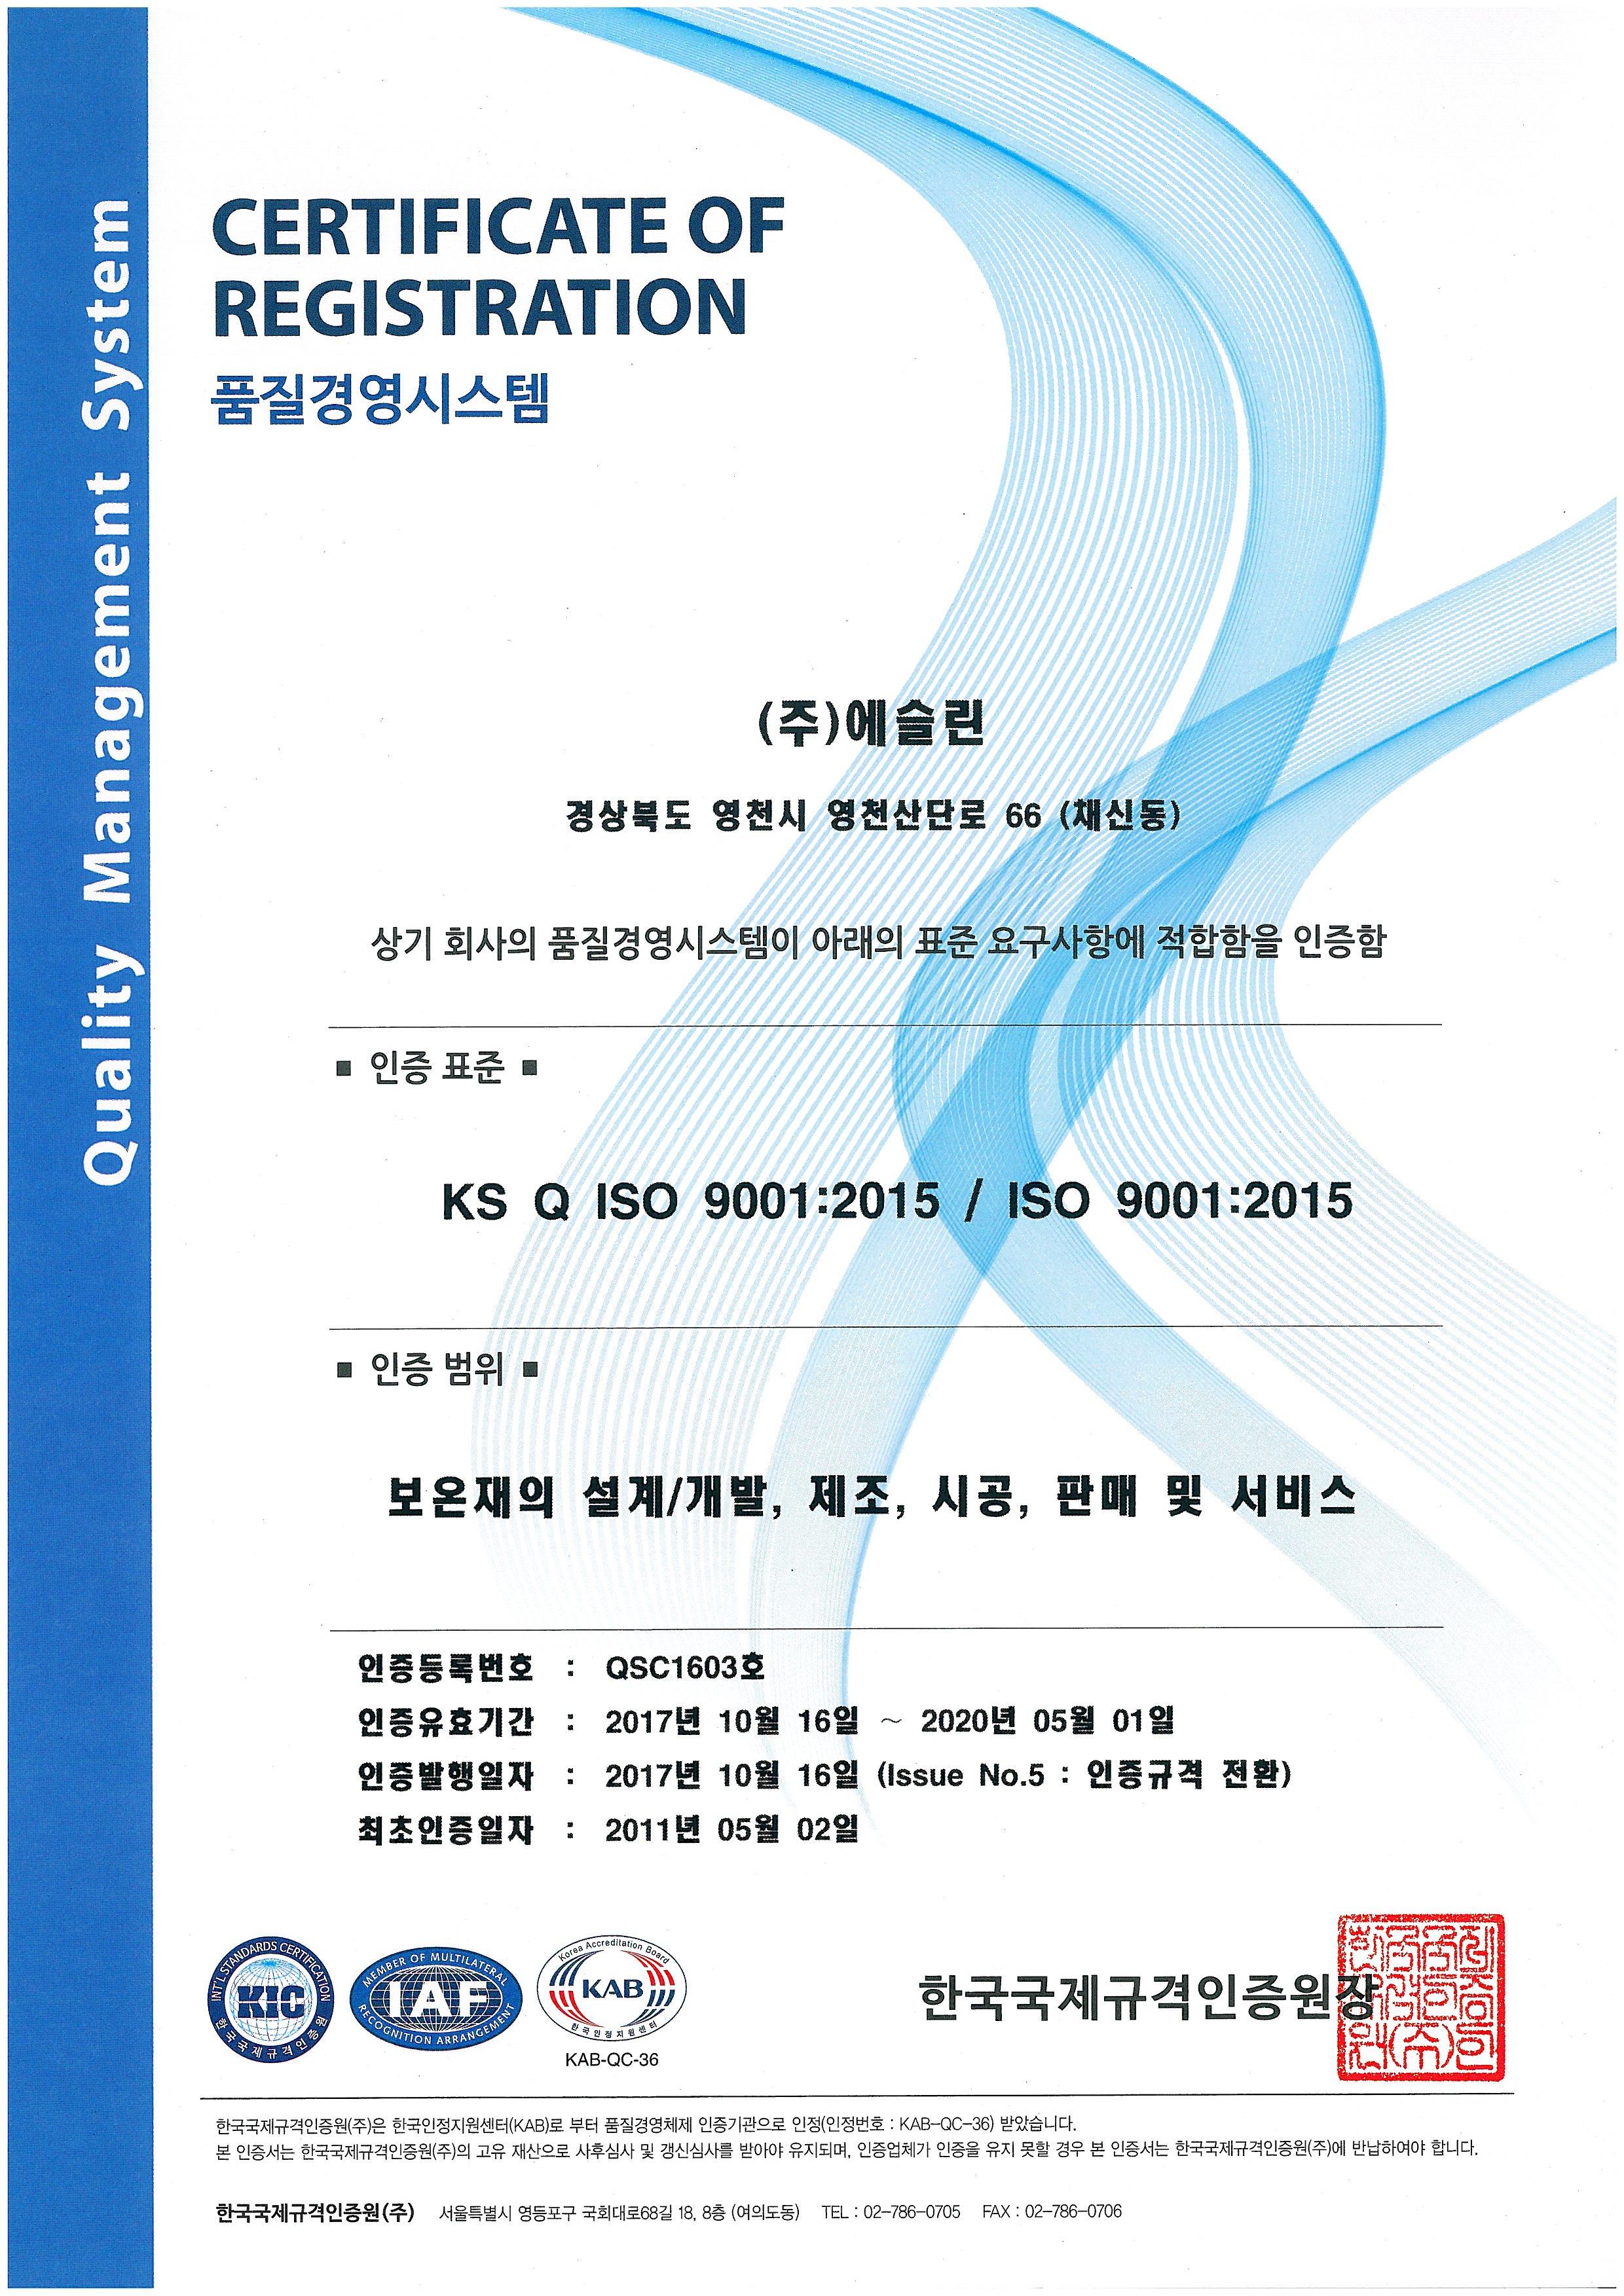 05_ISO9001_품질경영시스템인증서_(주)에슬린_Page_1.jpg